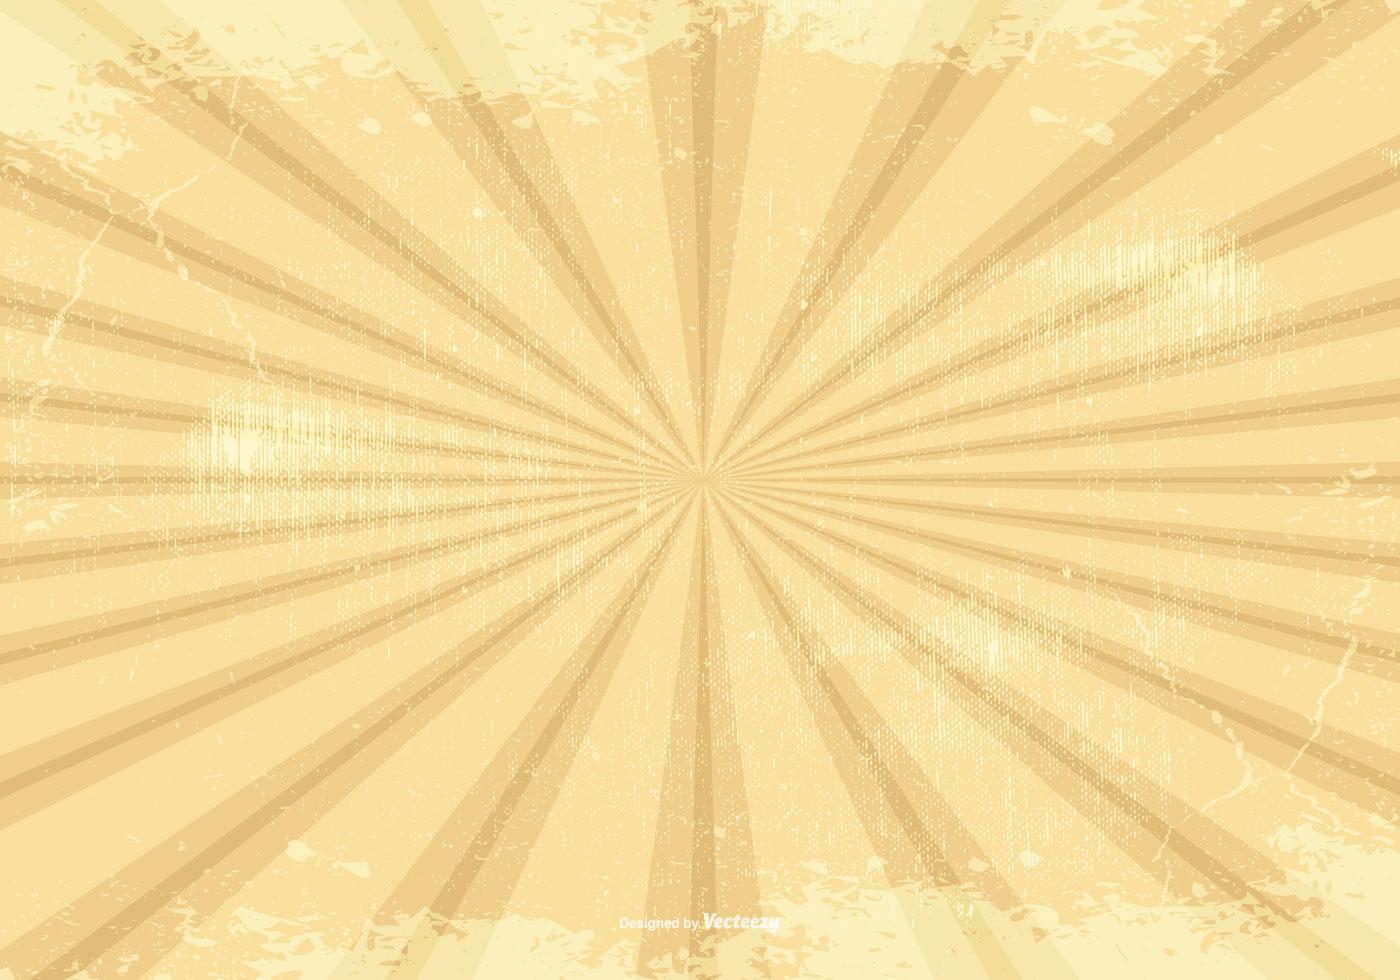 Retro Grunge Sunburst Background